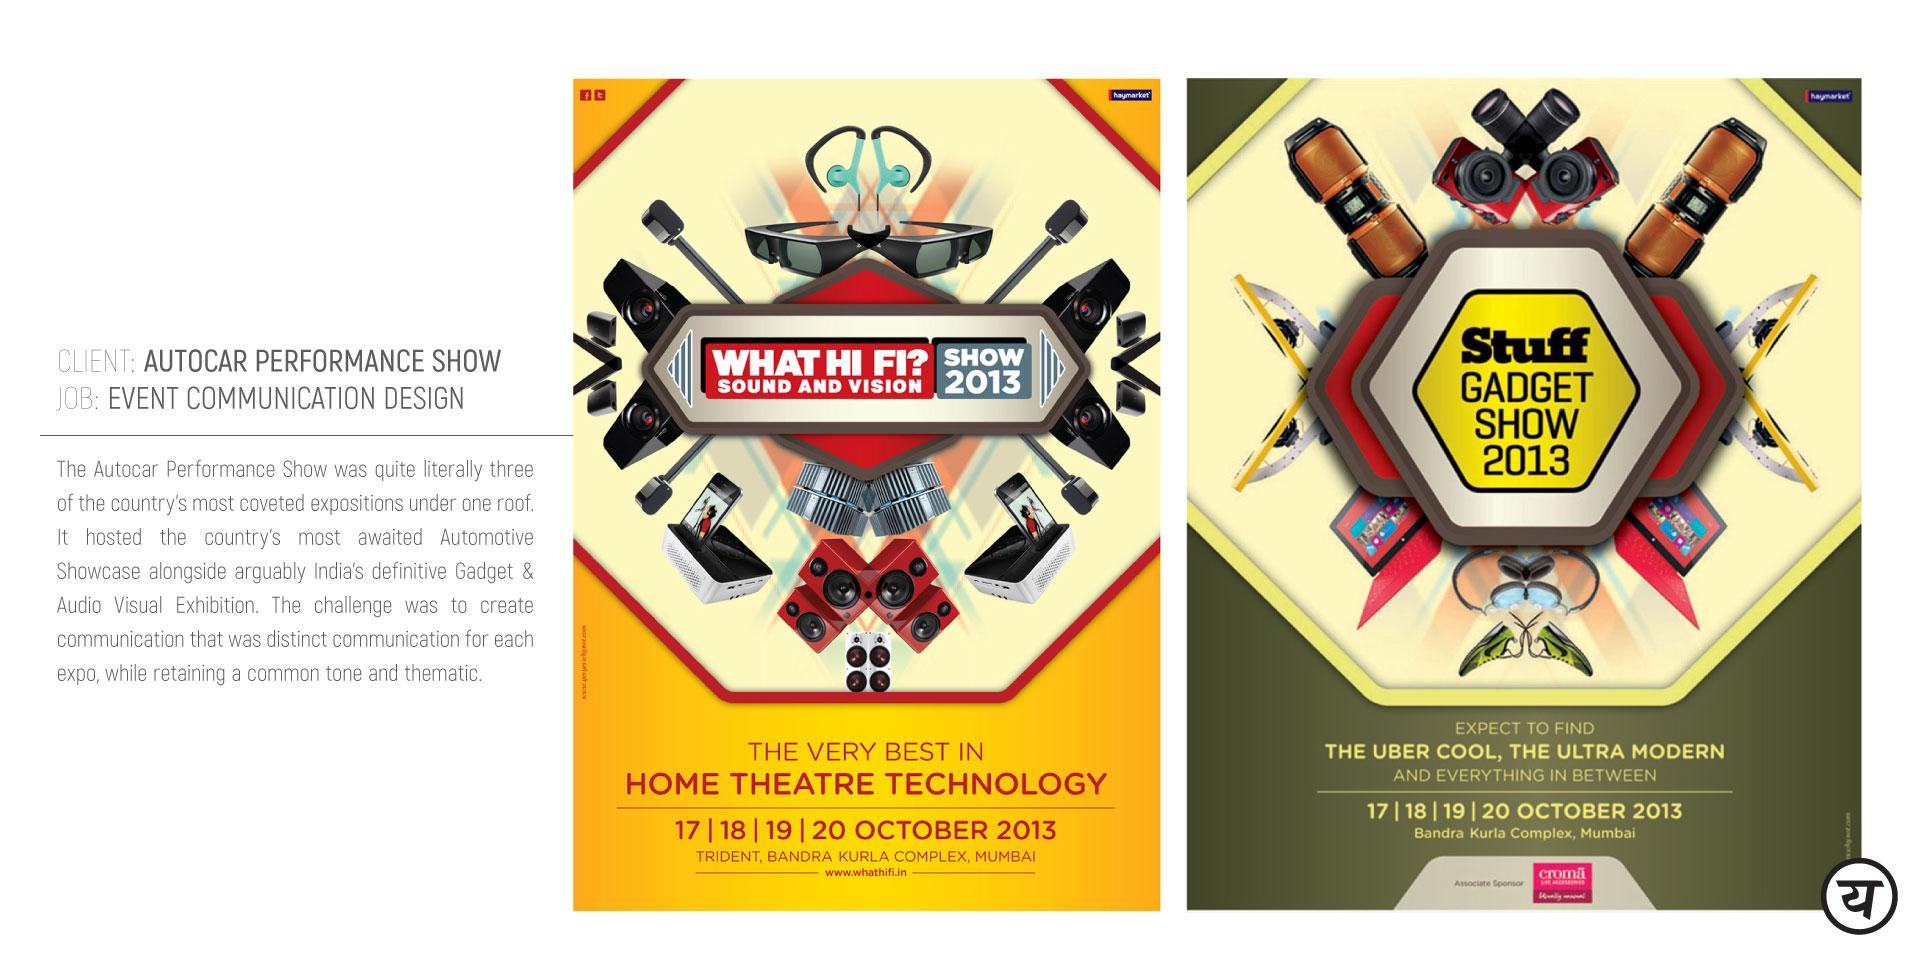 YesYesWhyNot_Communication-Design_Haymarket-#2_04.08.19